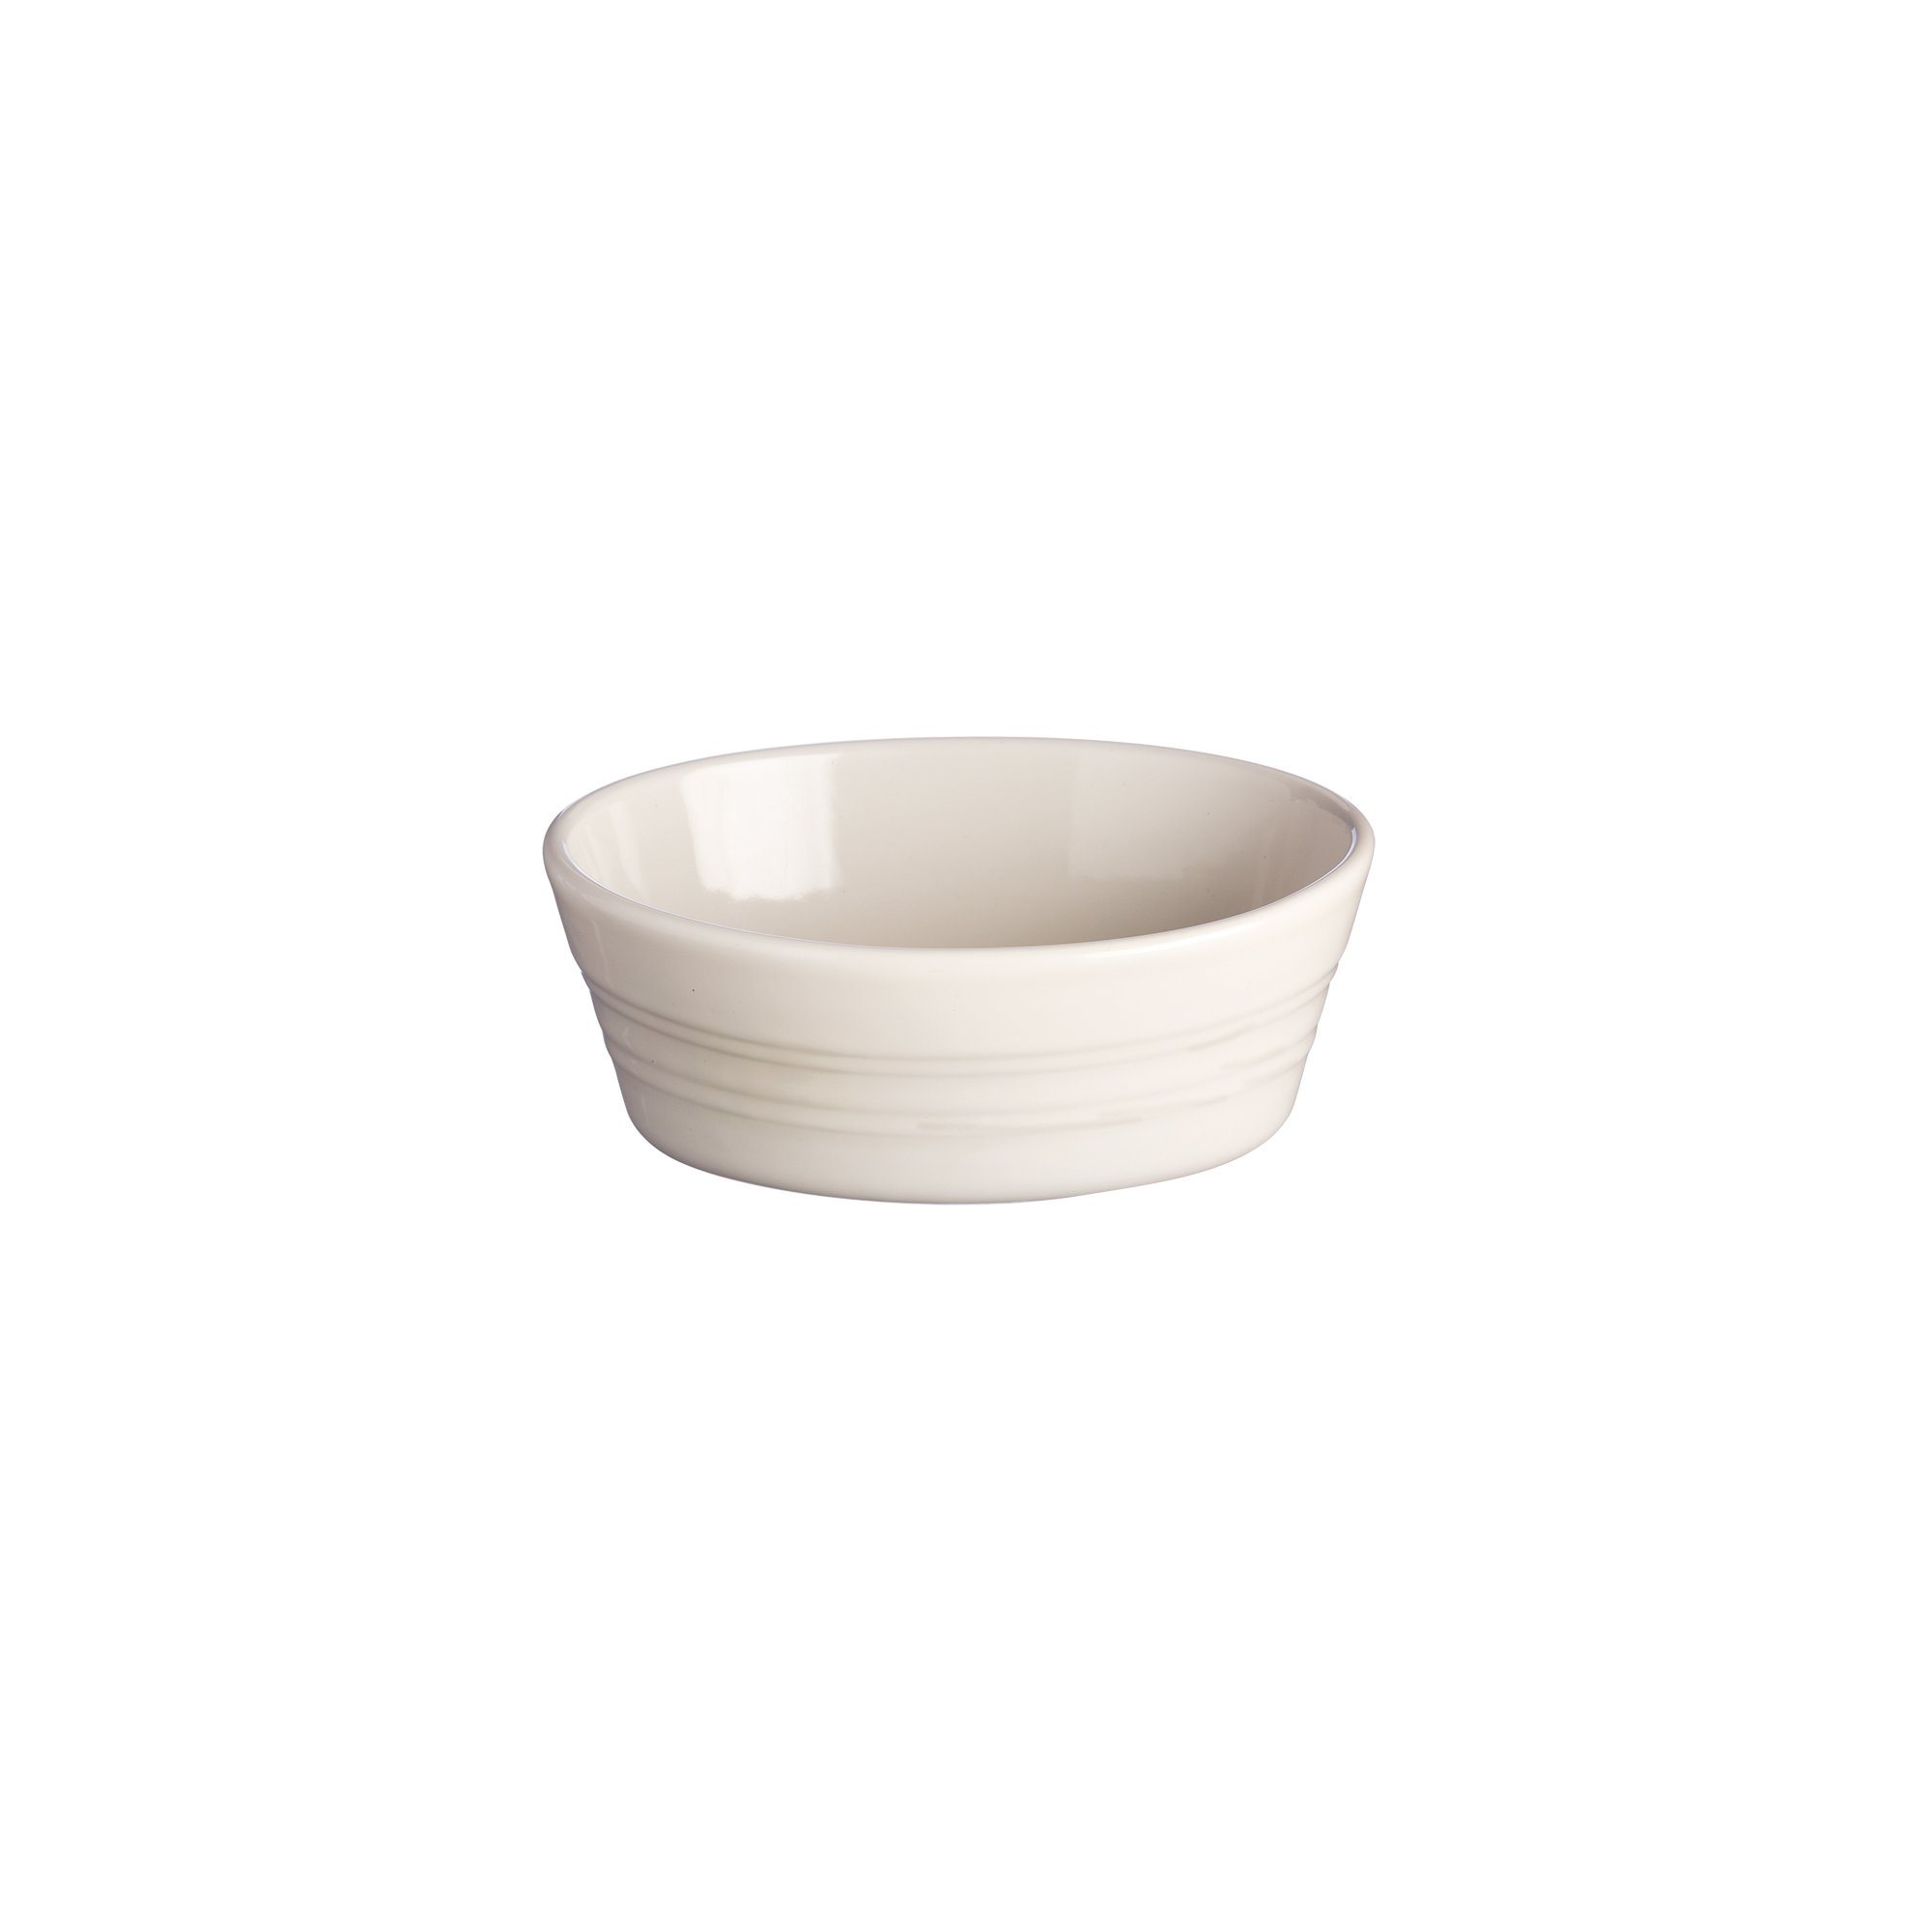 Mason Cash Original Stoneware Oval Pie Dish, 7-Inches by 4-1/2-Inches by 3-Inches, Cream